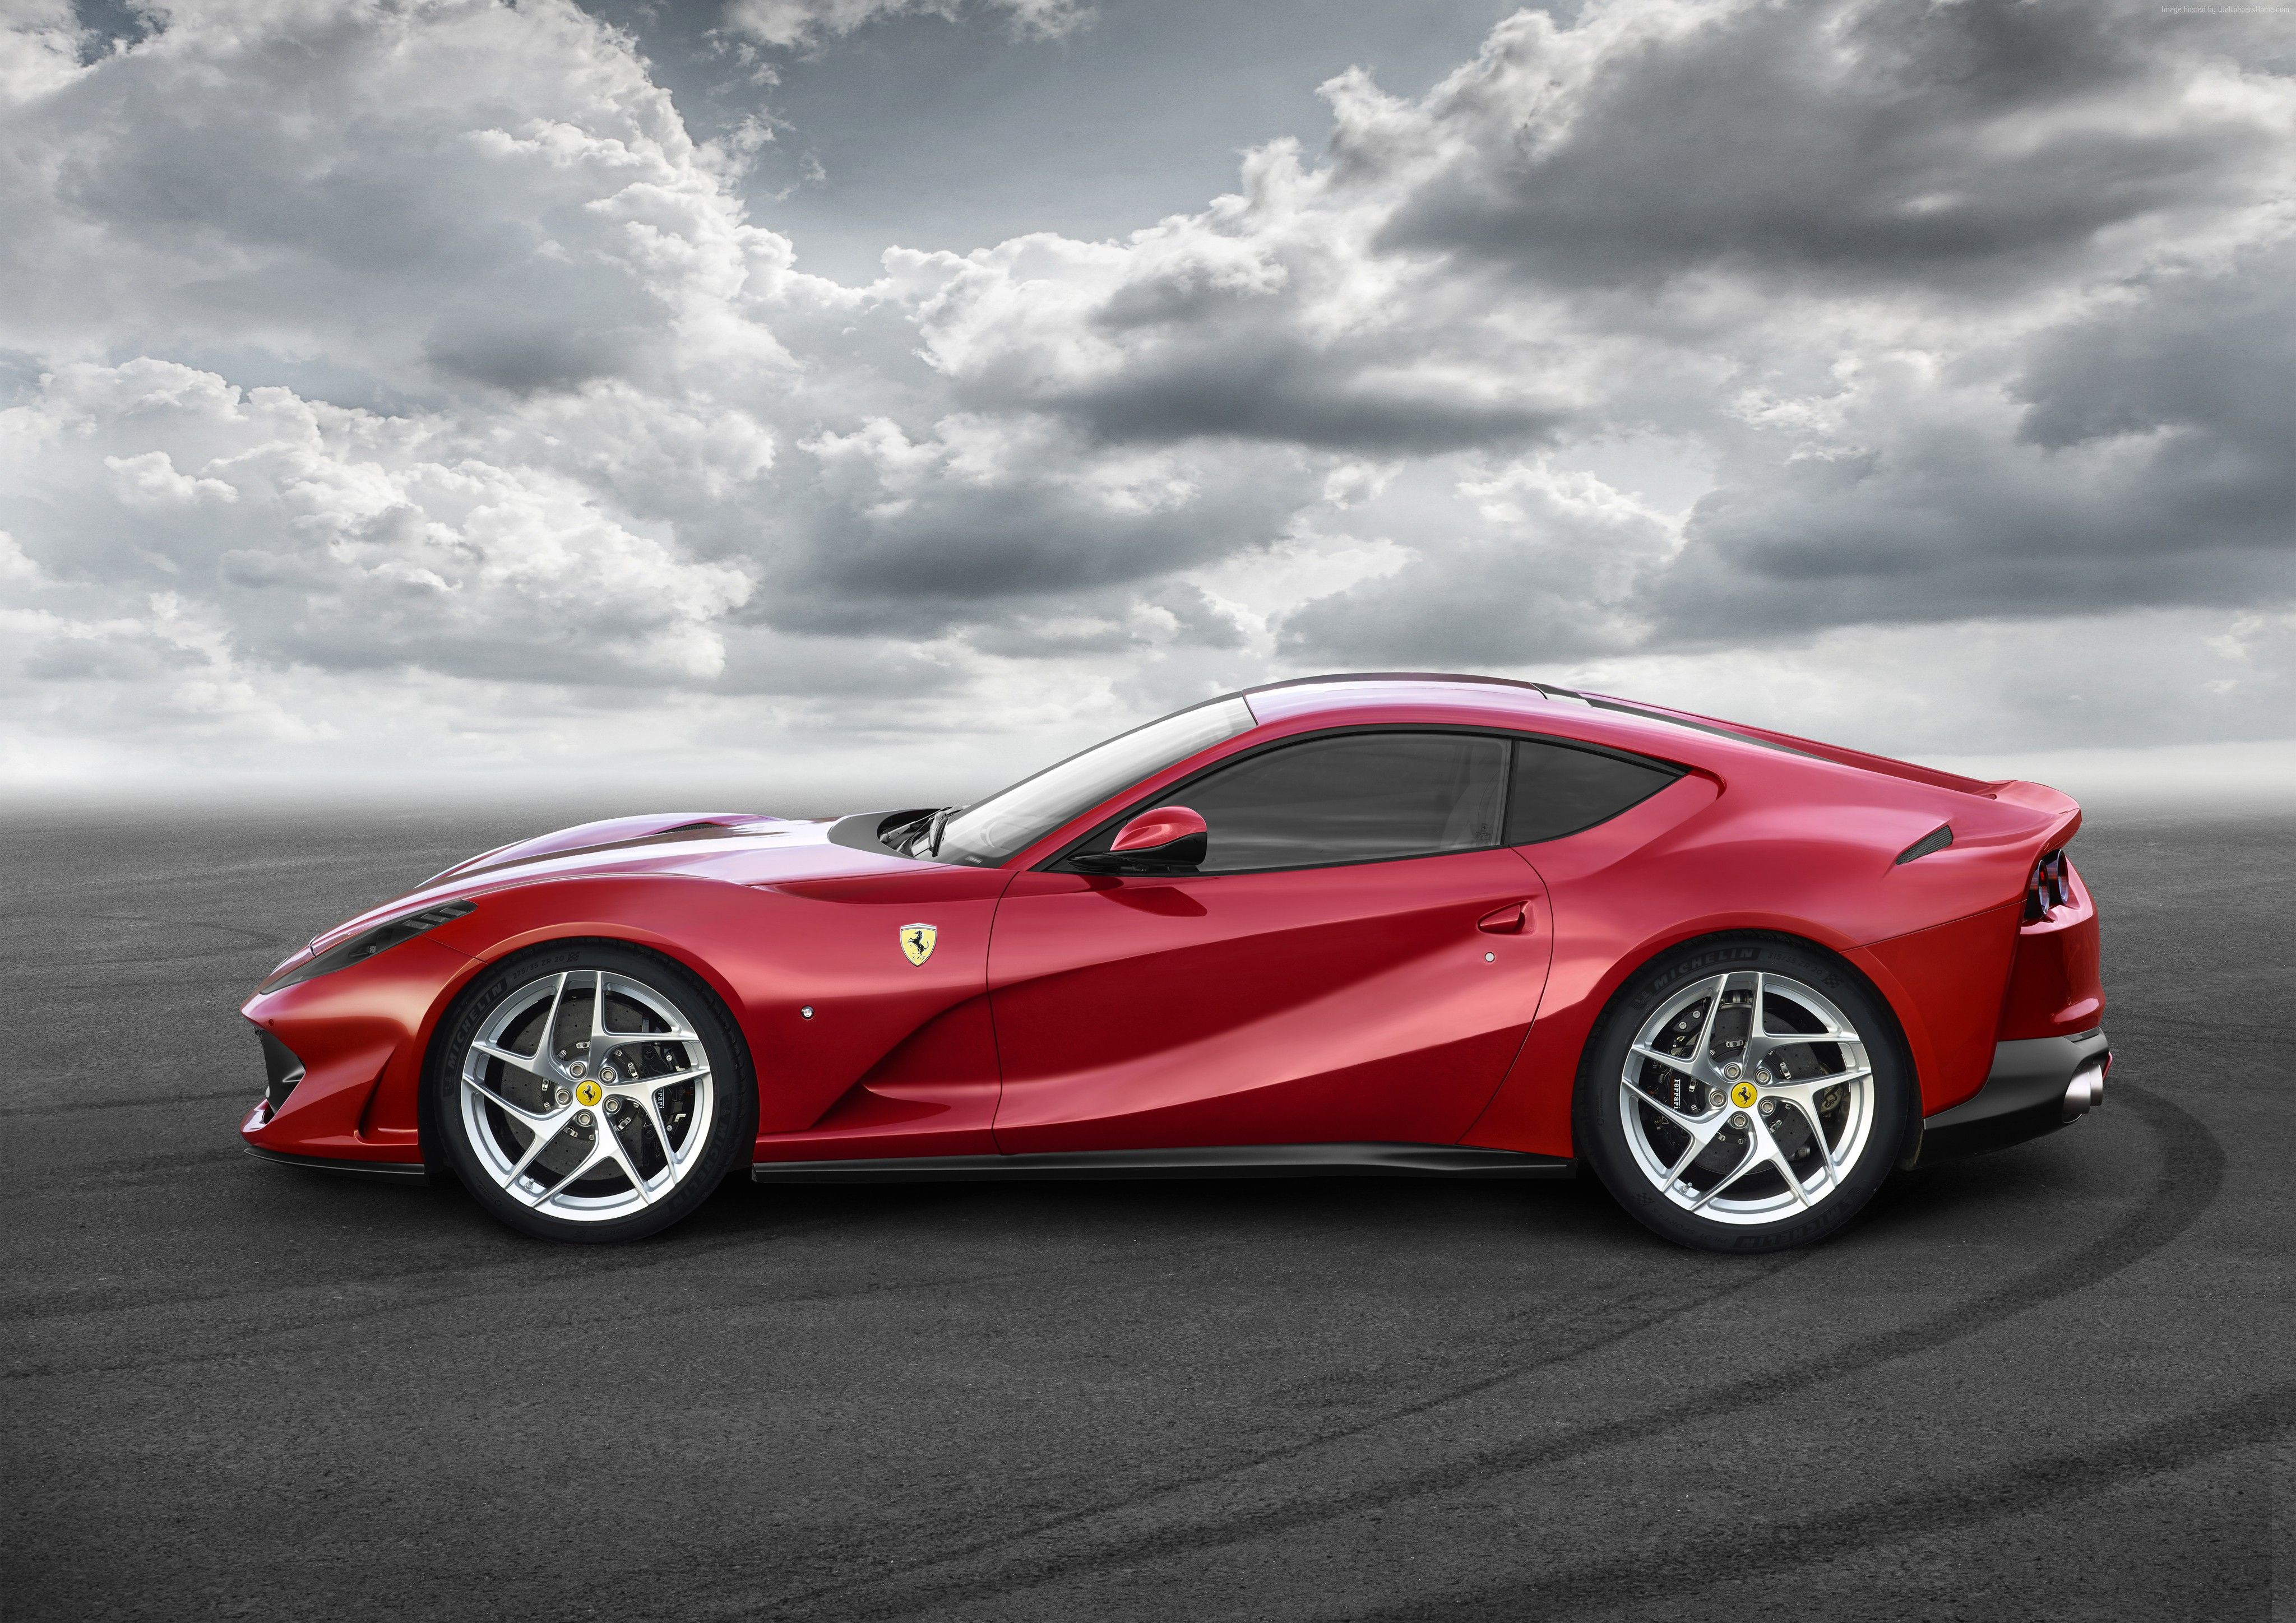 Ferrari Bike Wallpaper Download